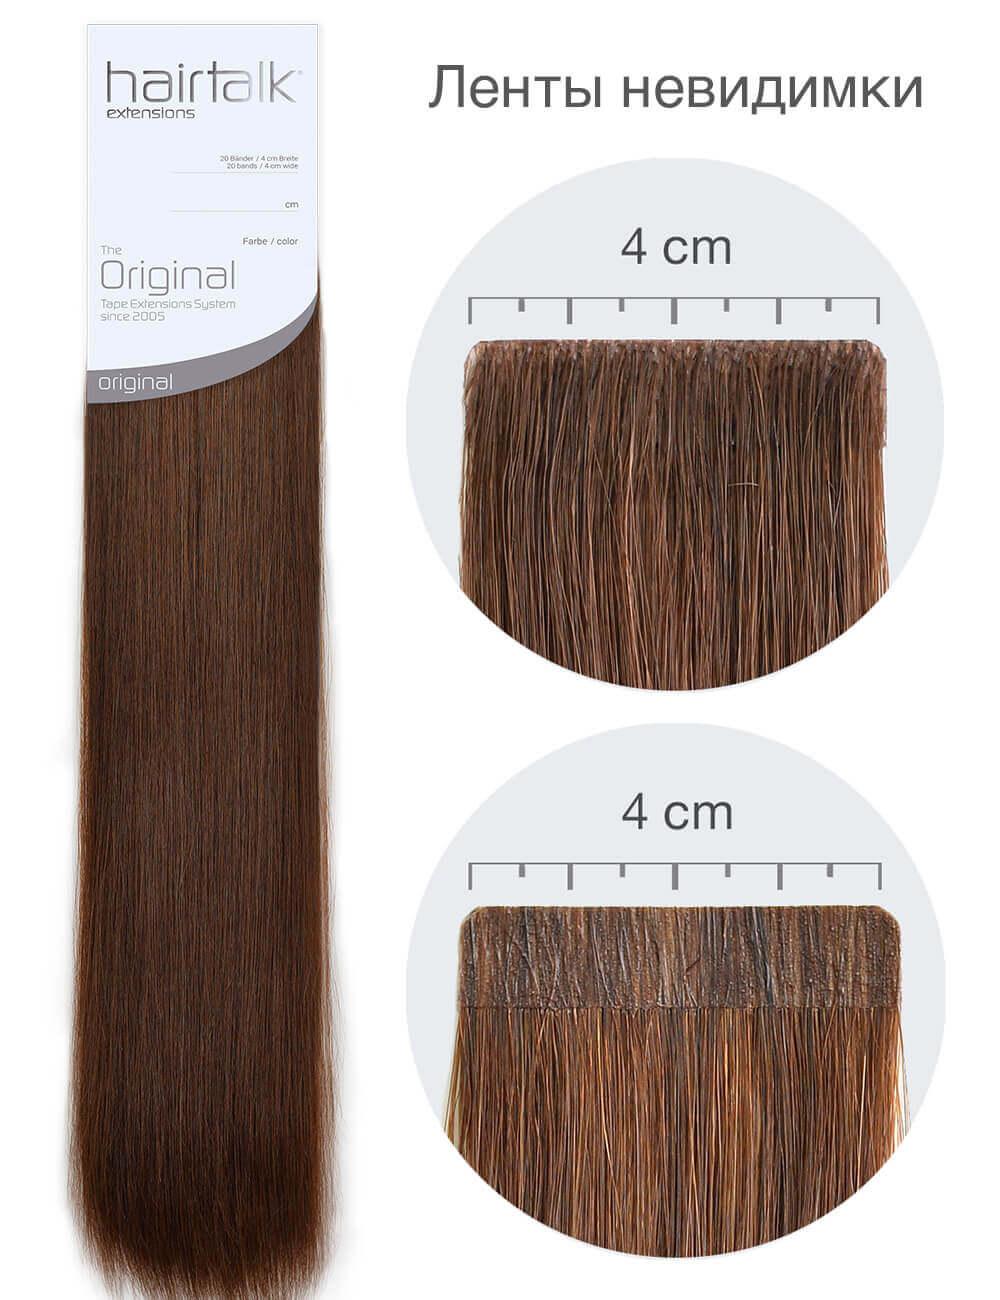 Hair talk extensions colors